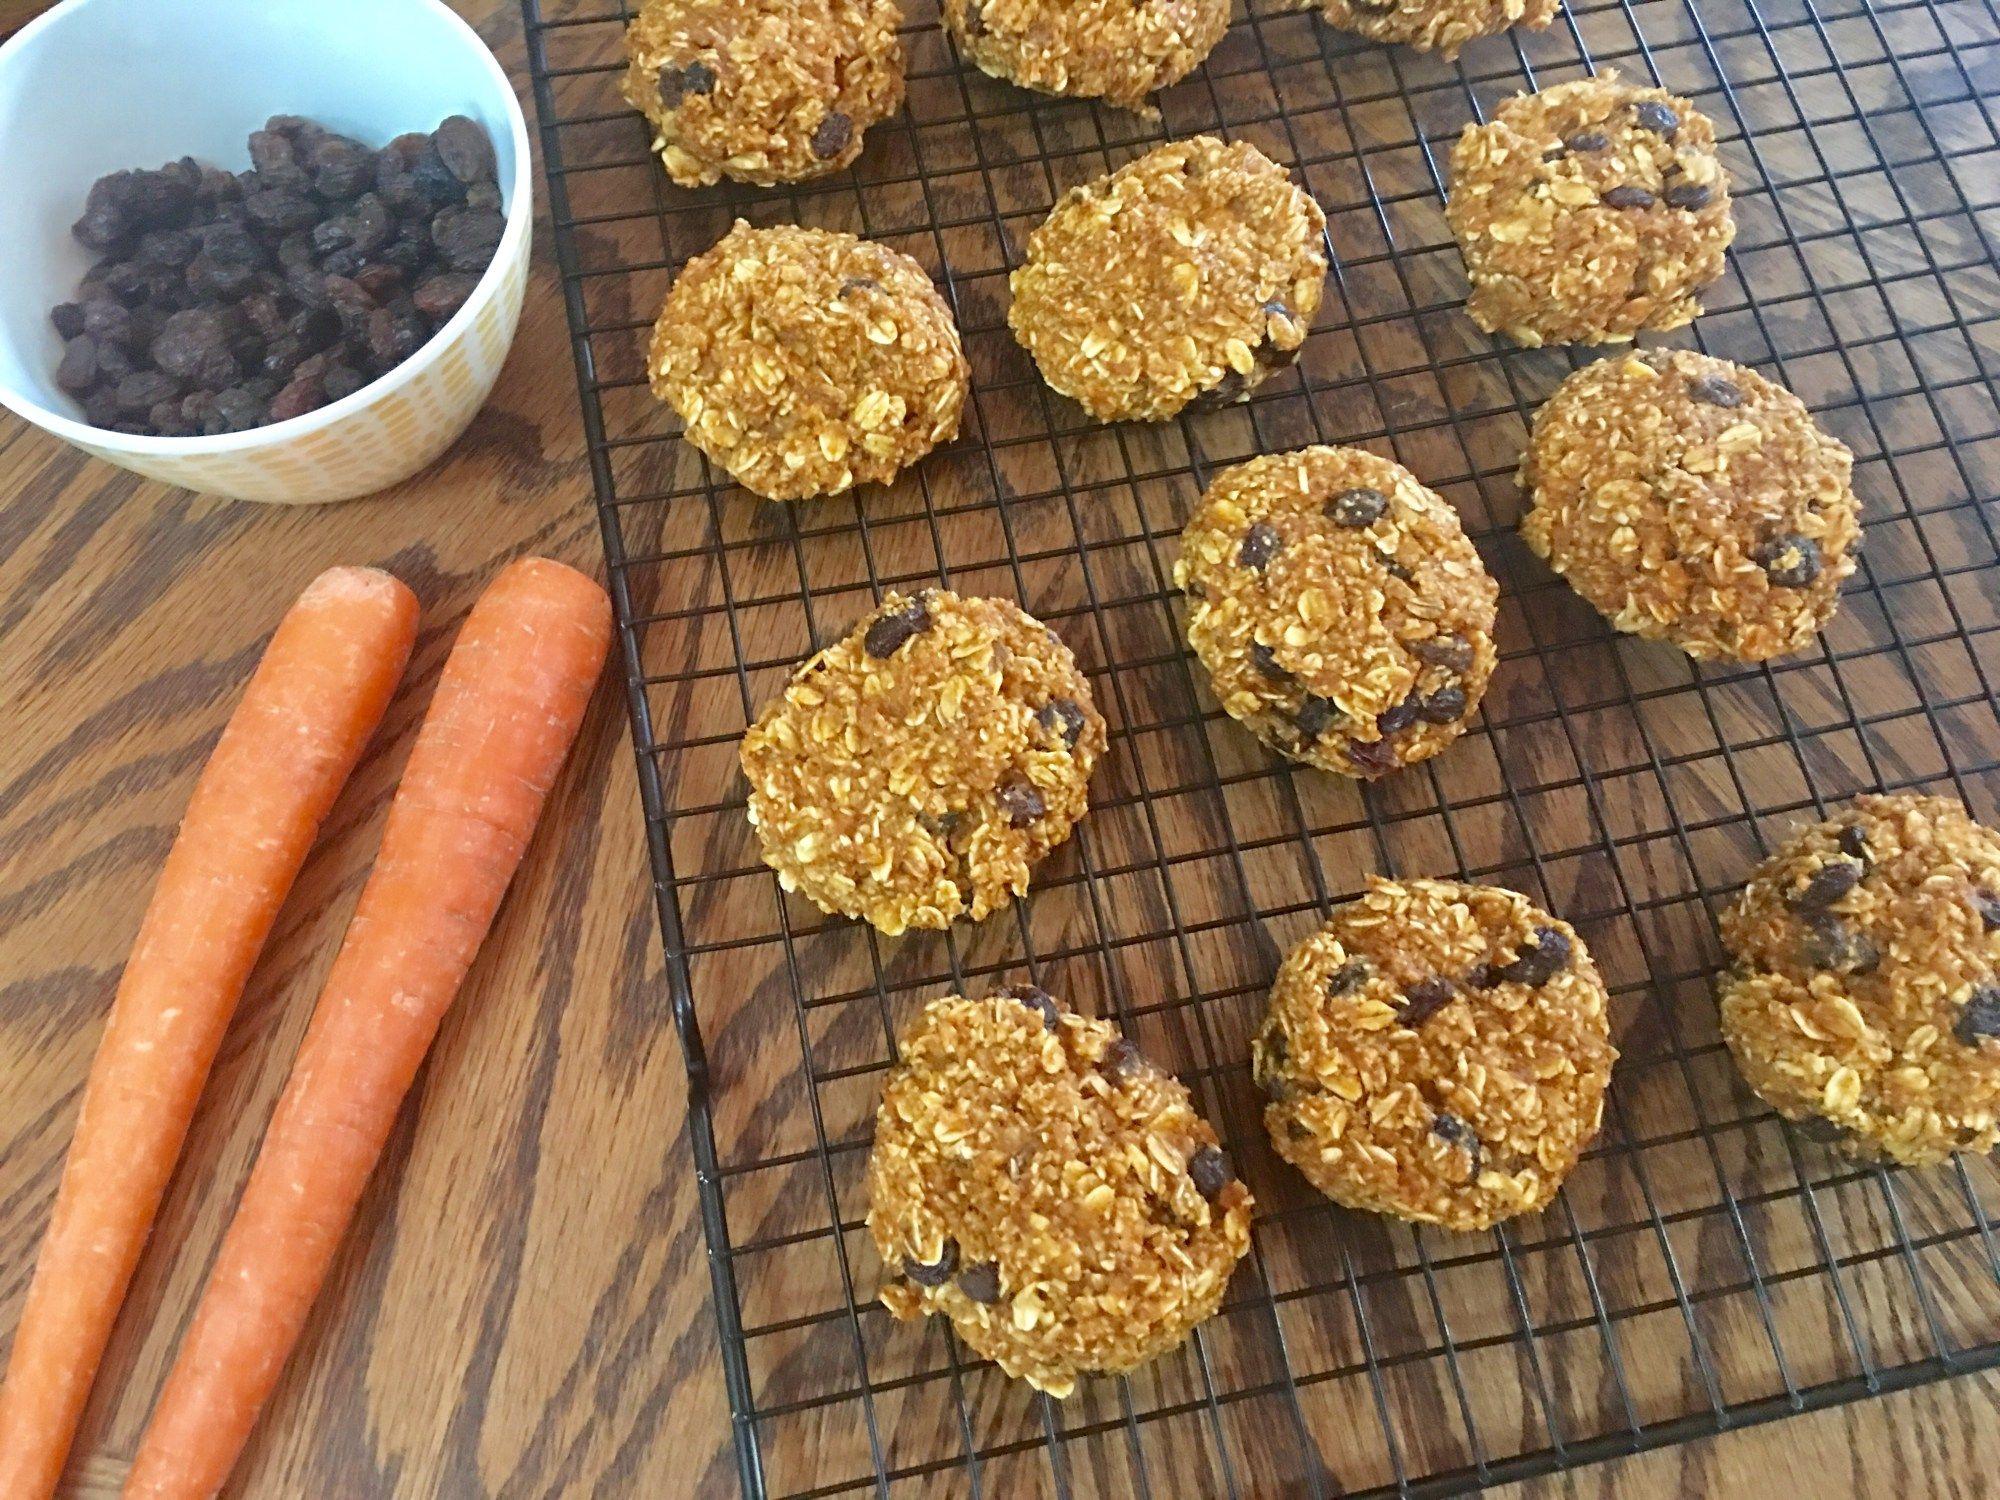 Glutenfree and sugarfree carrot raisin oatmeal cookies